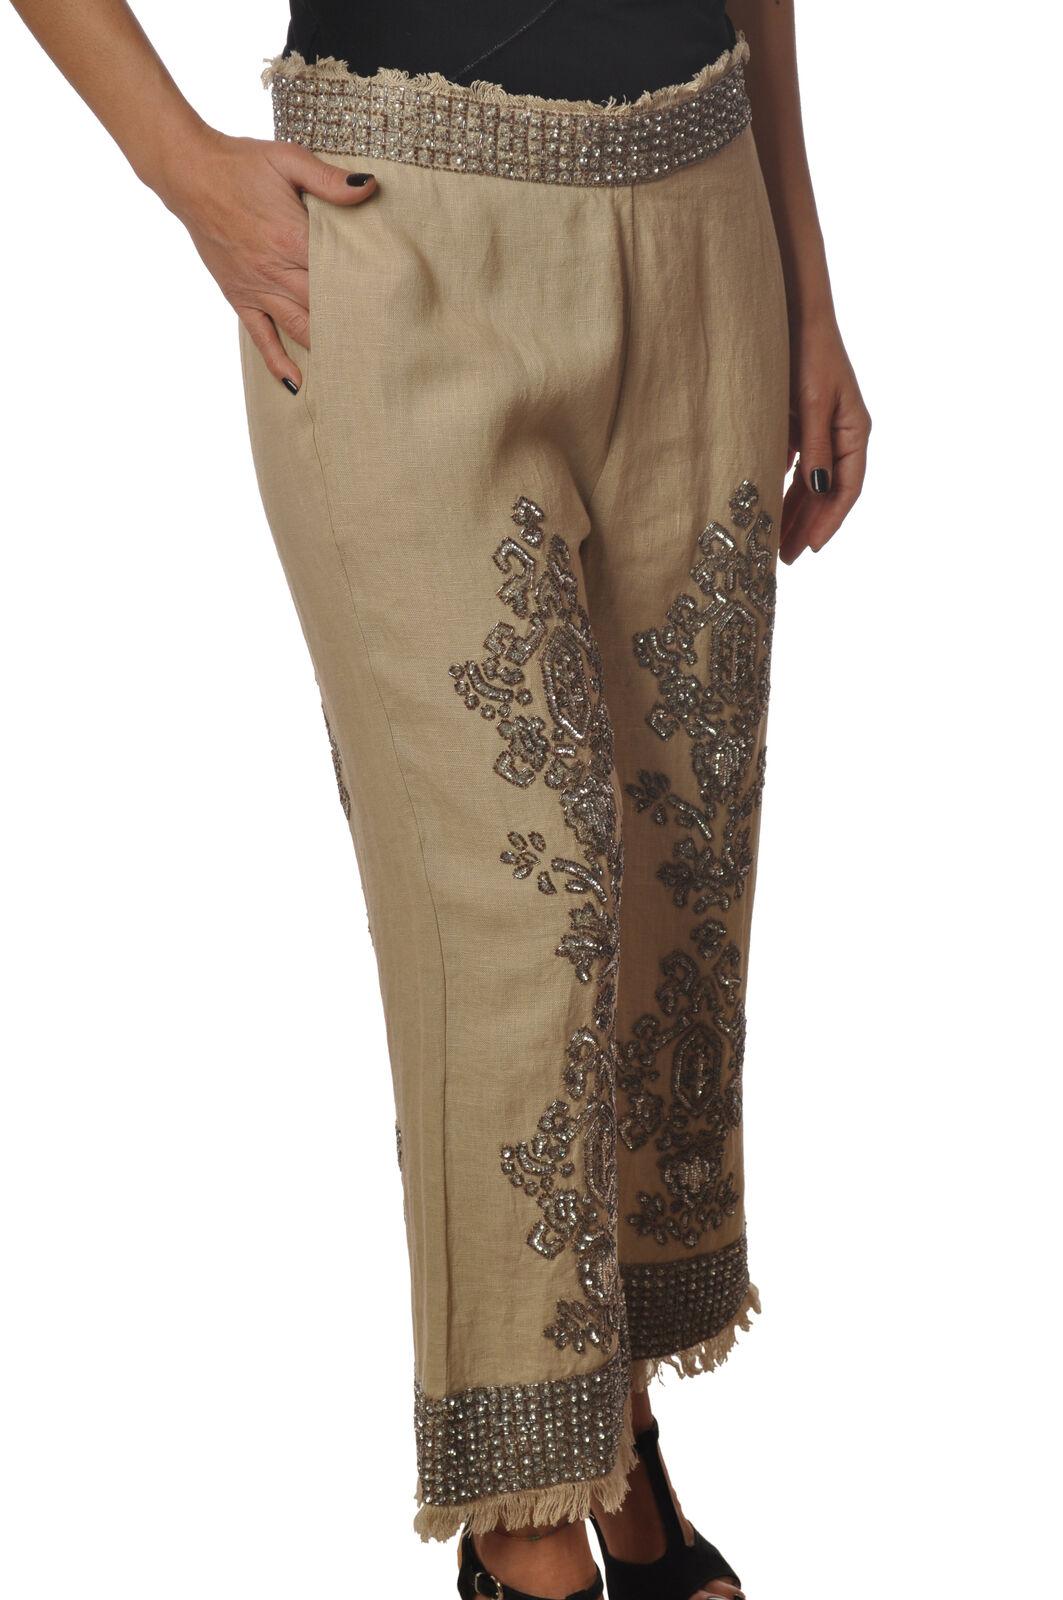 Twin Set - Pants-Pants - Woman - Beige - 6249601E191643